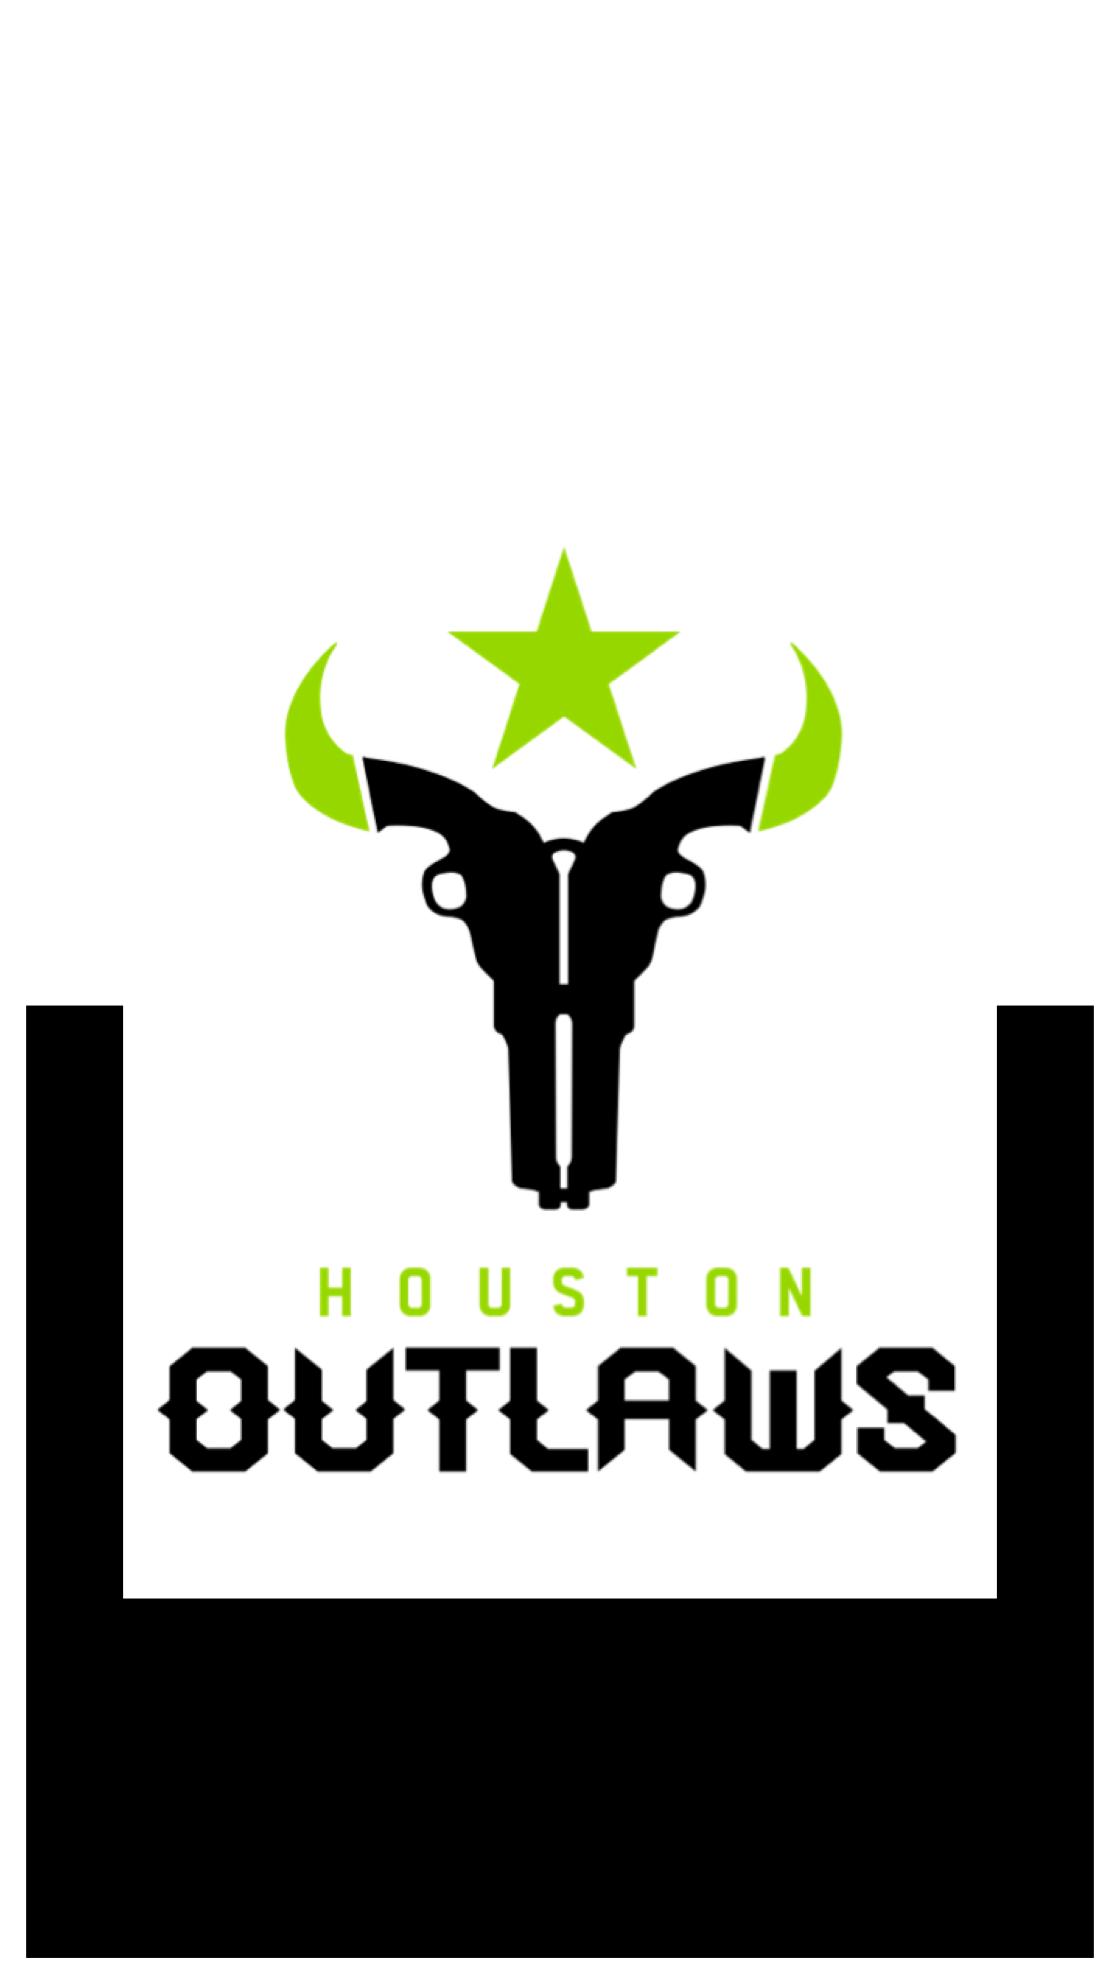 Houston Outlaws Funny Attitude Quotes Instagram Followers Attitude Quotes